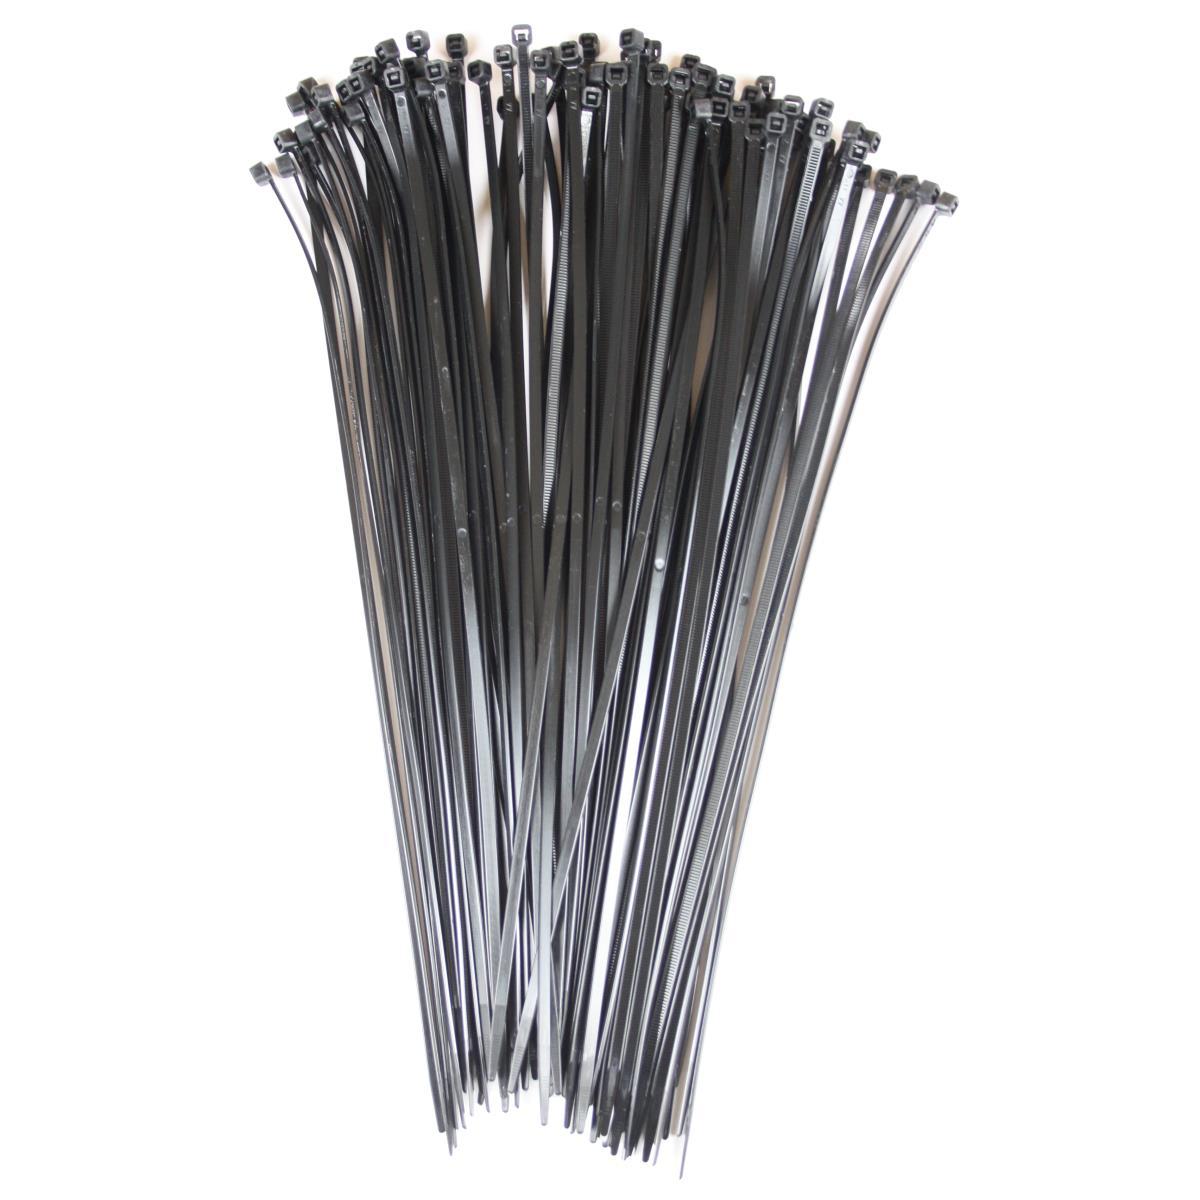 Kabelbinder 100 Stück schwarz 2,5 x 100 mm,Elektro-Plast,WI008017, 5906839008017